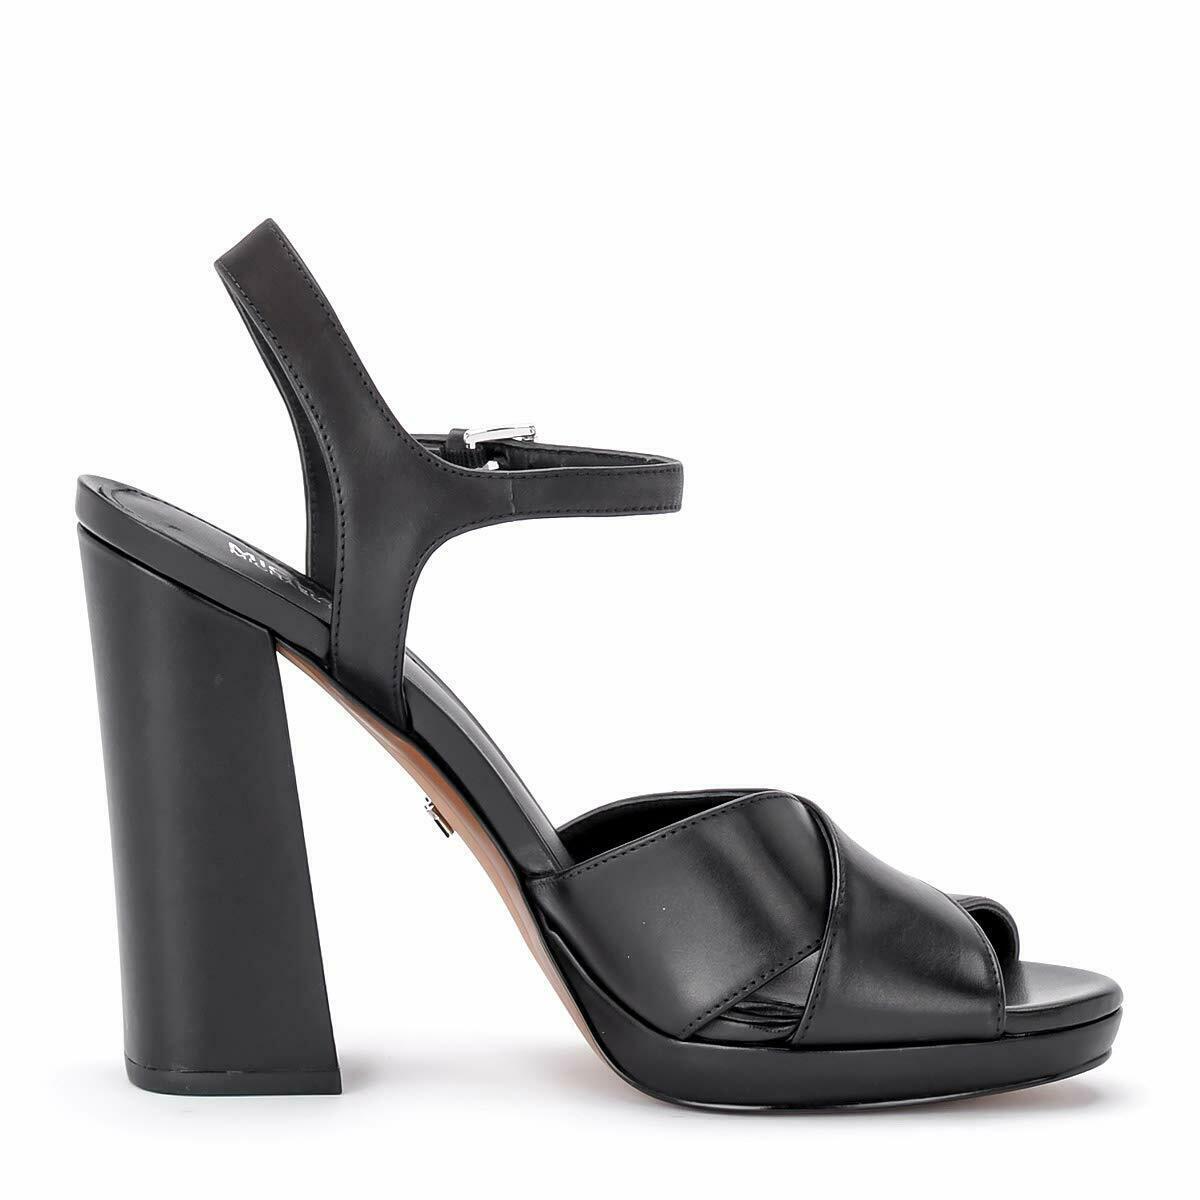 MICHAEL Michael Kors Alexia Platform Block Heel Sandals, Multi Sizes Black Leath